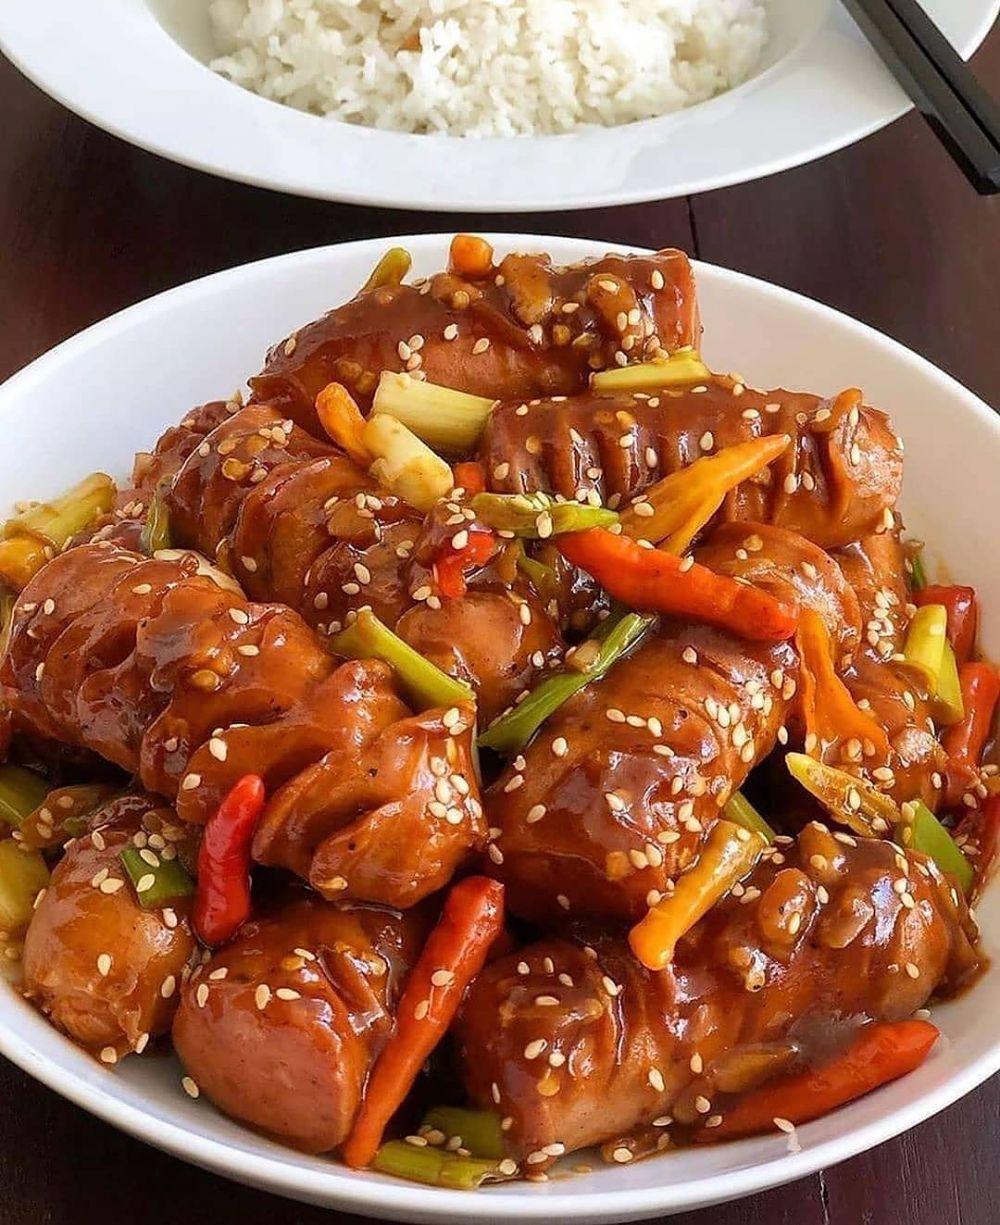 Resep Masakan Saus Barbeque Instagram Resep Masakan Resep Sosis Resep